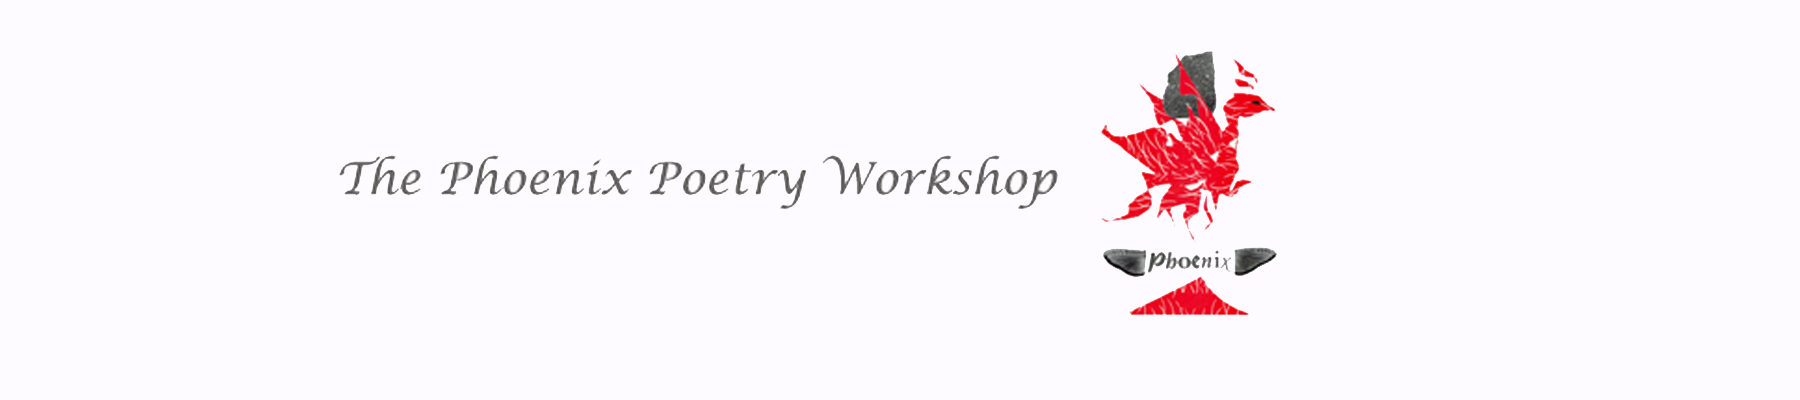 The Phoenix Poetry Workshop